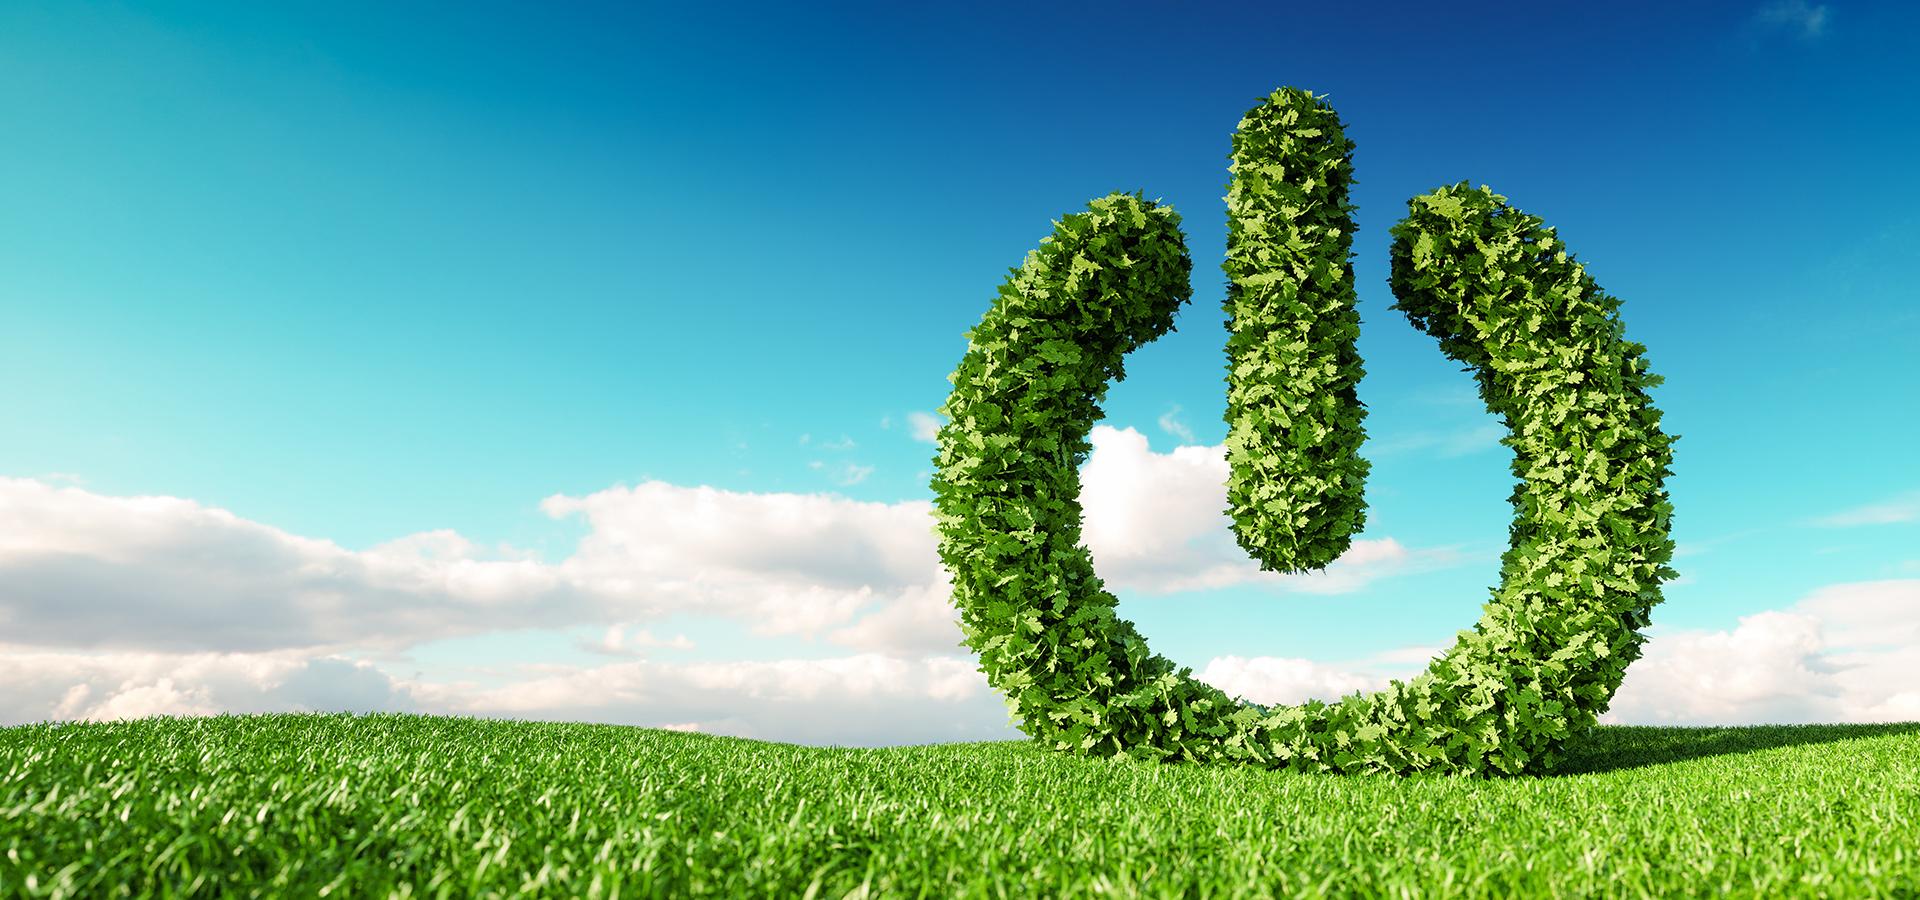 Green power symbol in a green field